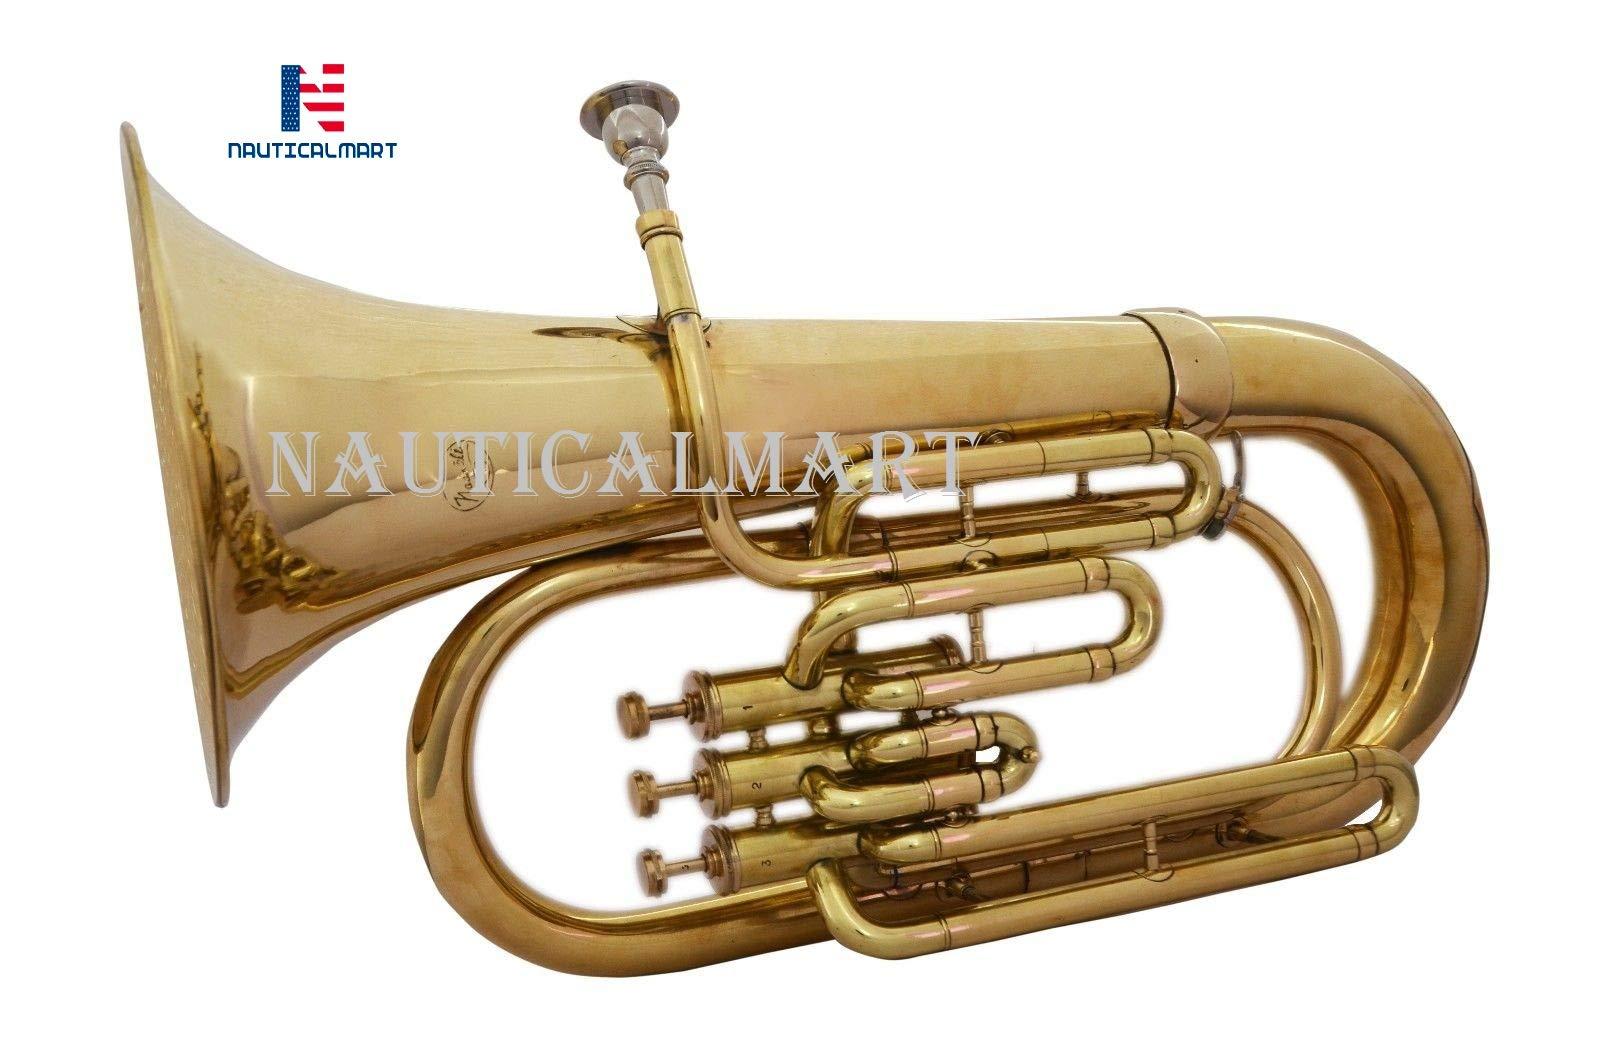 NauticalMart Full Brass Bb Euphonium 3 Valve